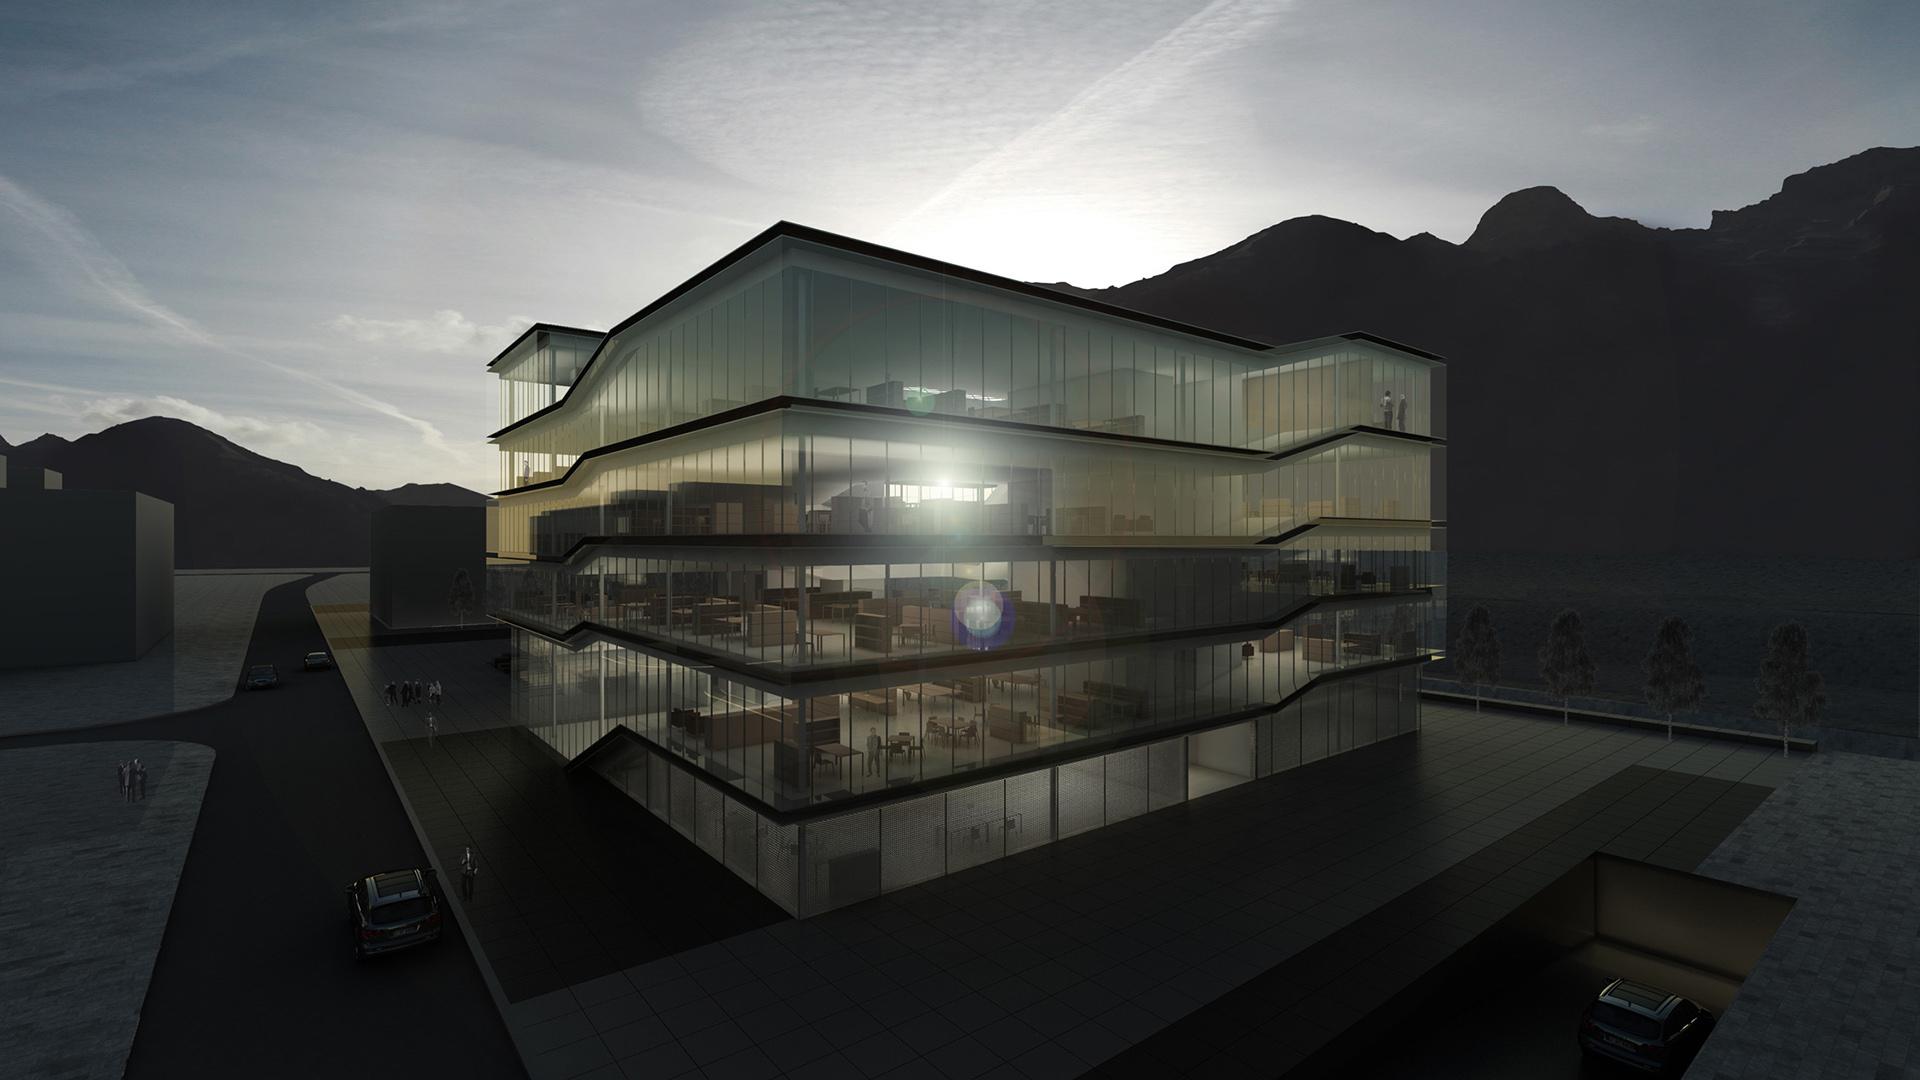 004-first-office-building-buero-philipp-moeller.jpg